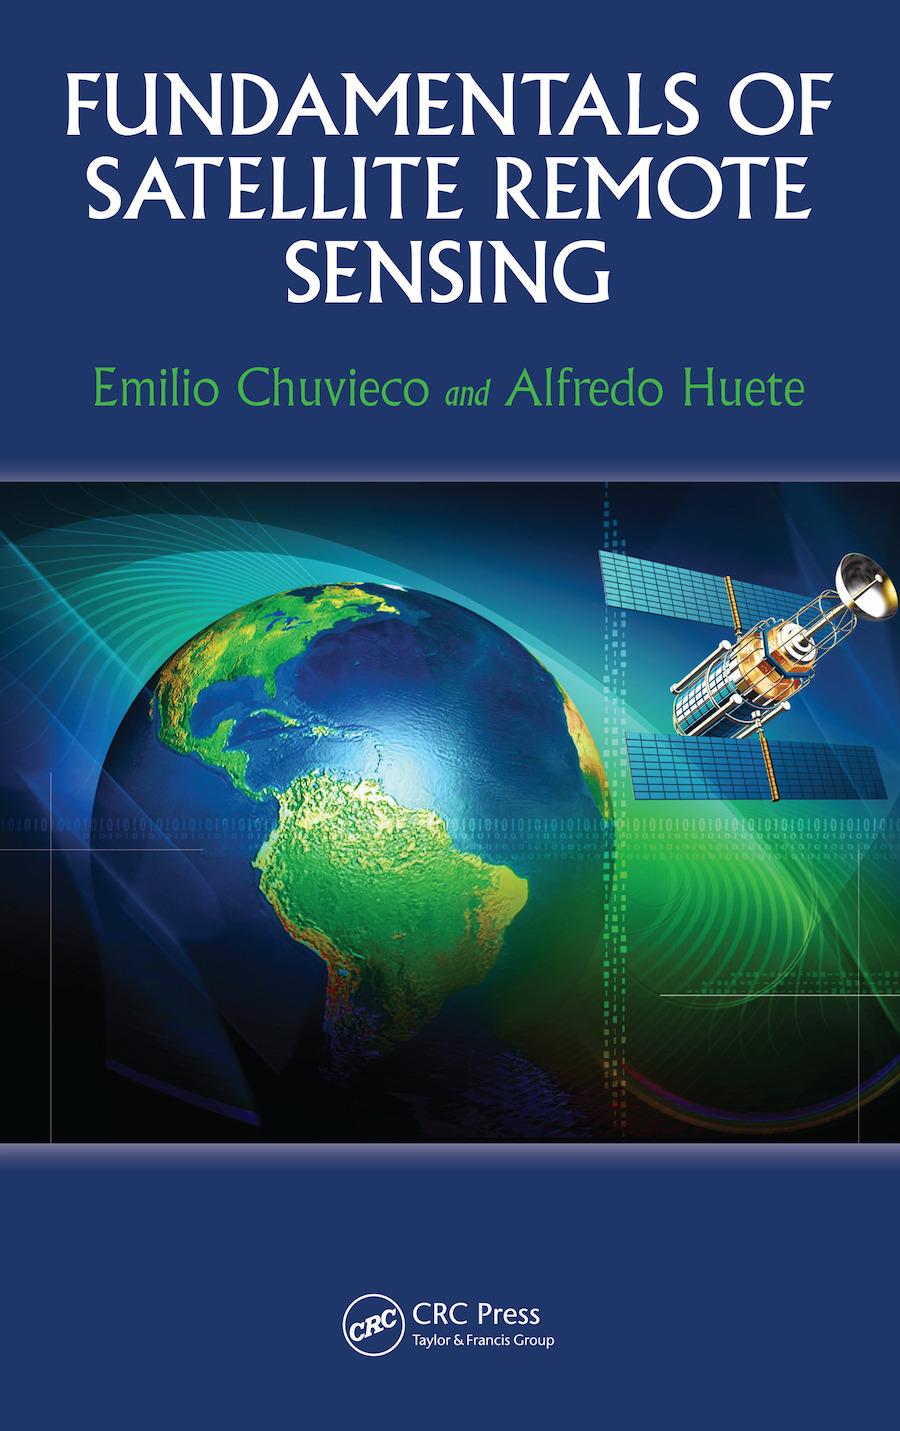 Fundamentals of Satellite Remote Sensing book cover